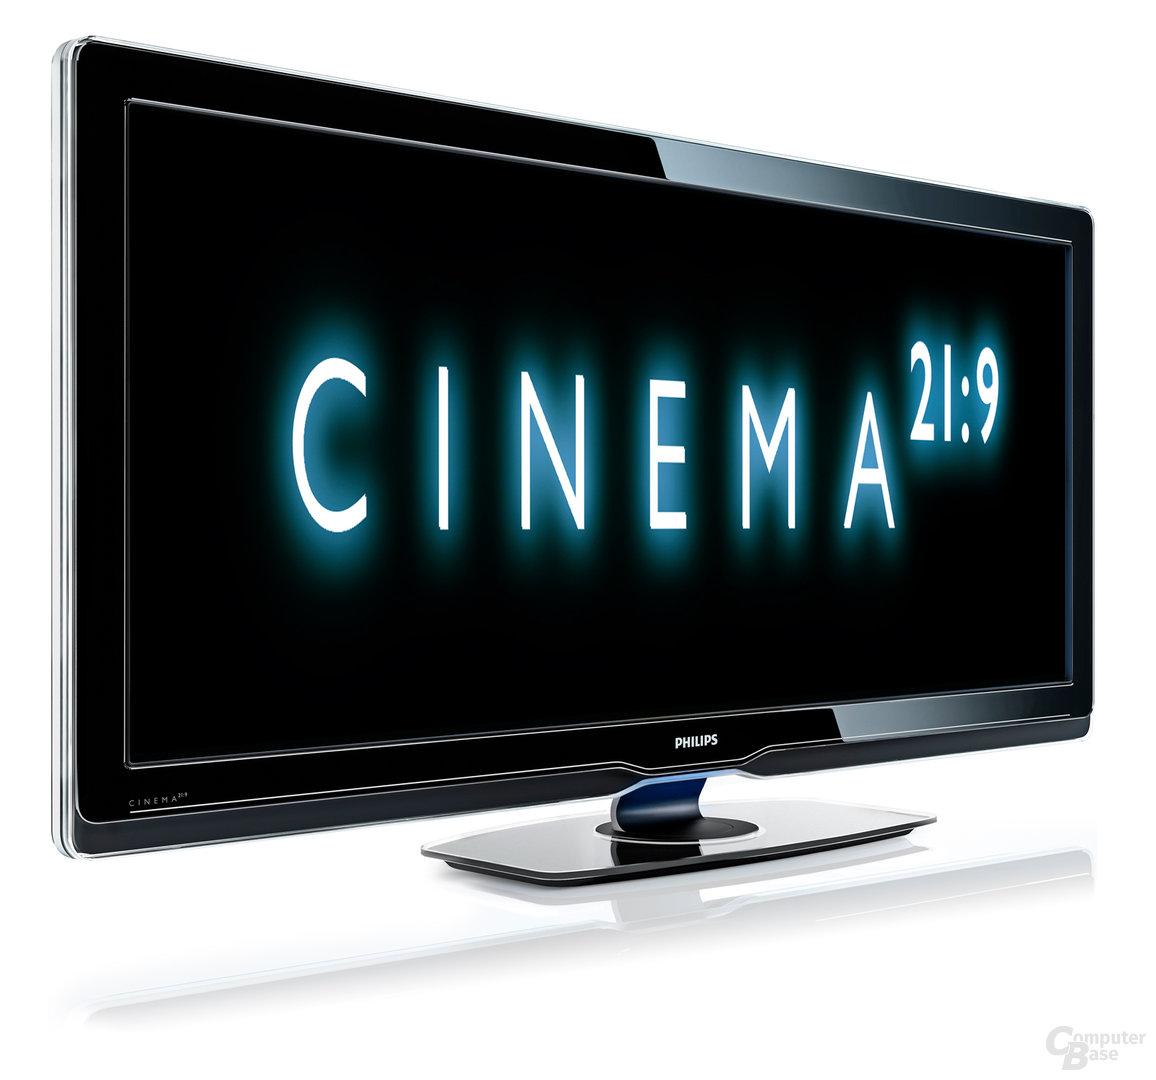 Philips-TV im Cenemascope-Format (21:9)